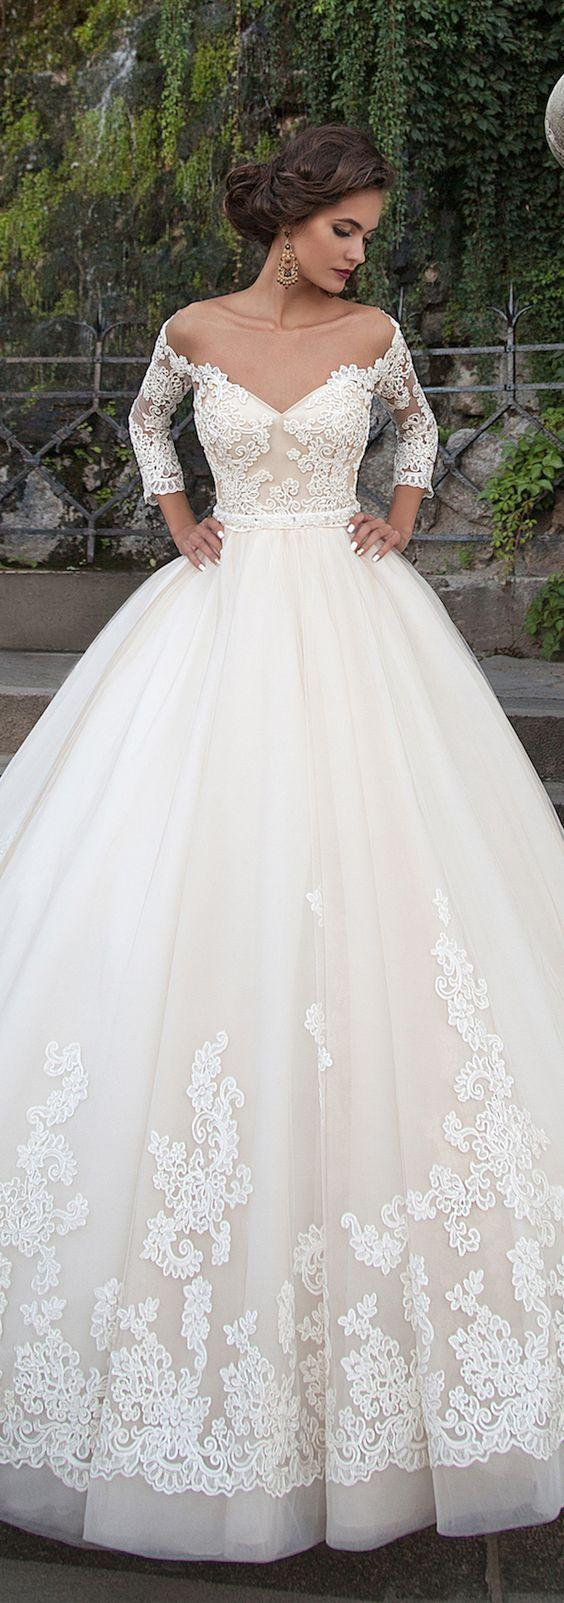 زفاف - 15 Stunning Wedding Dresses To Inspire You